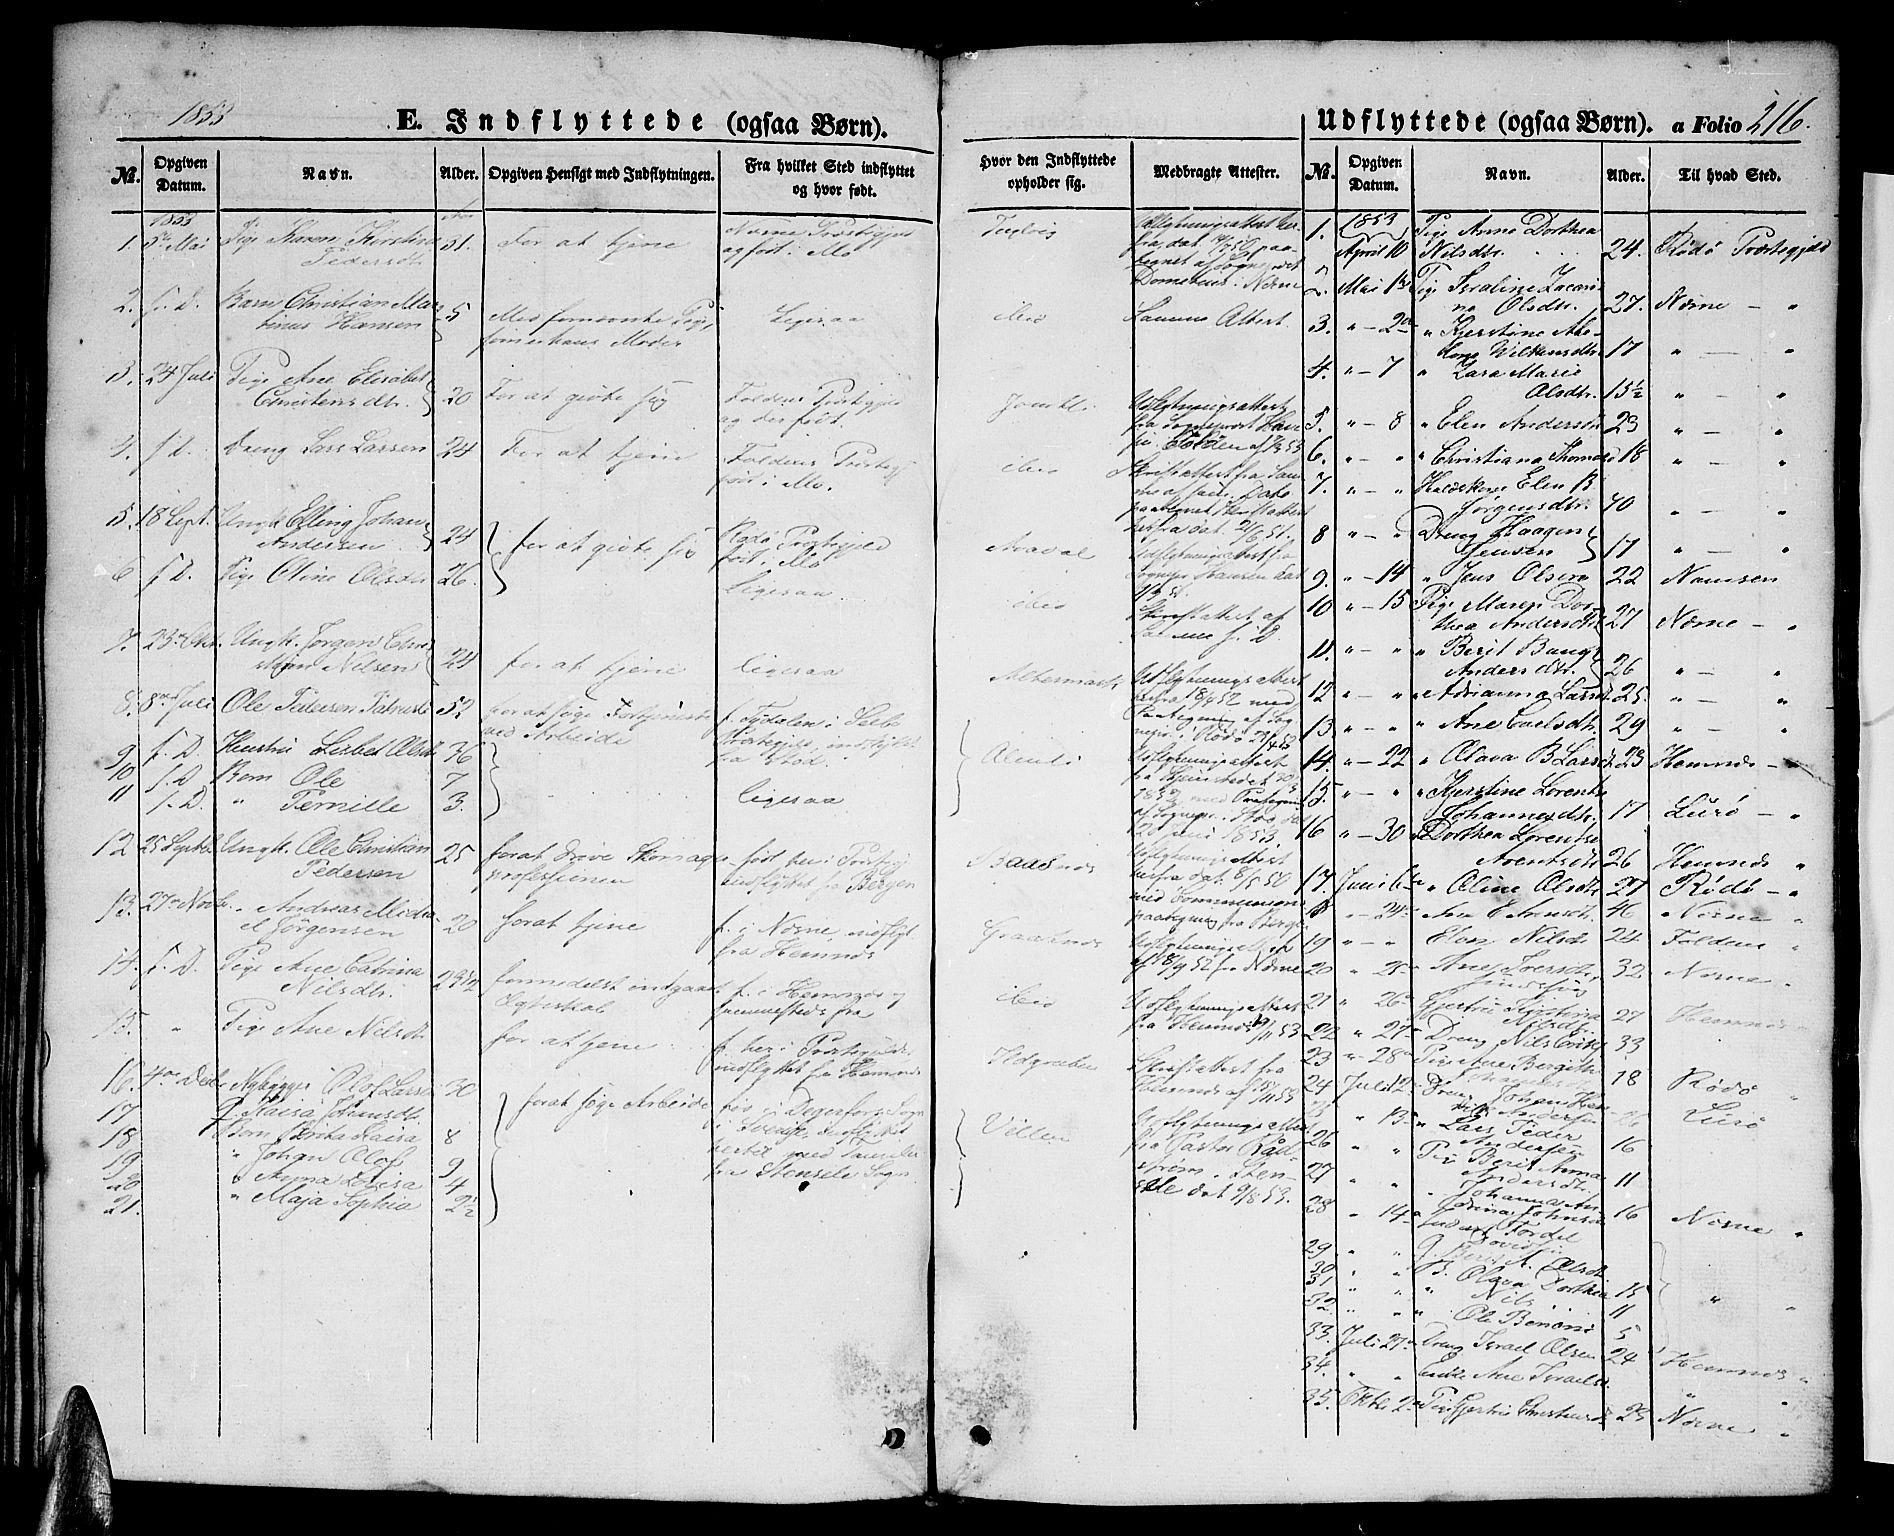 SAT, Ministerialprotokoller, klokkerbøker og fødselsregistre - Nordland, 827/L0414: Klokkerbok nr. 827C03, 1853-1865, s. 216